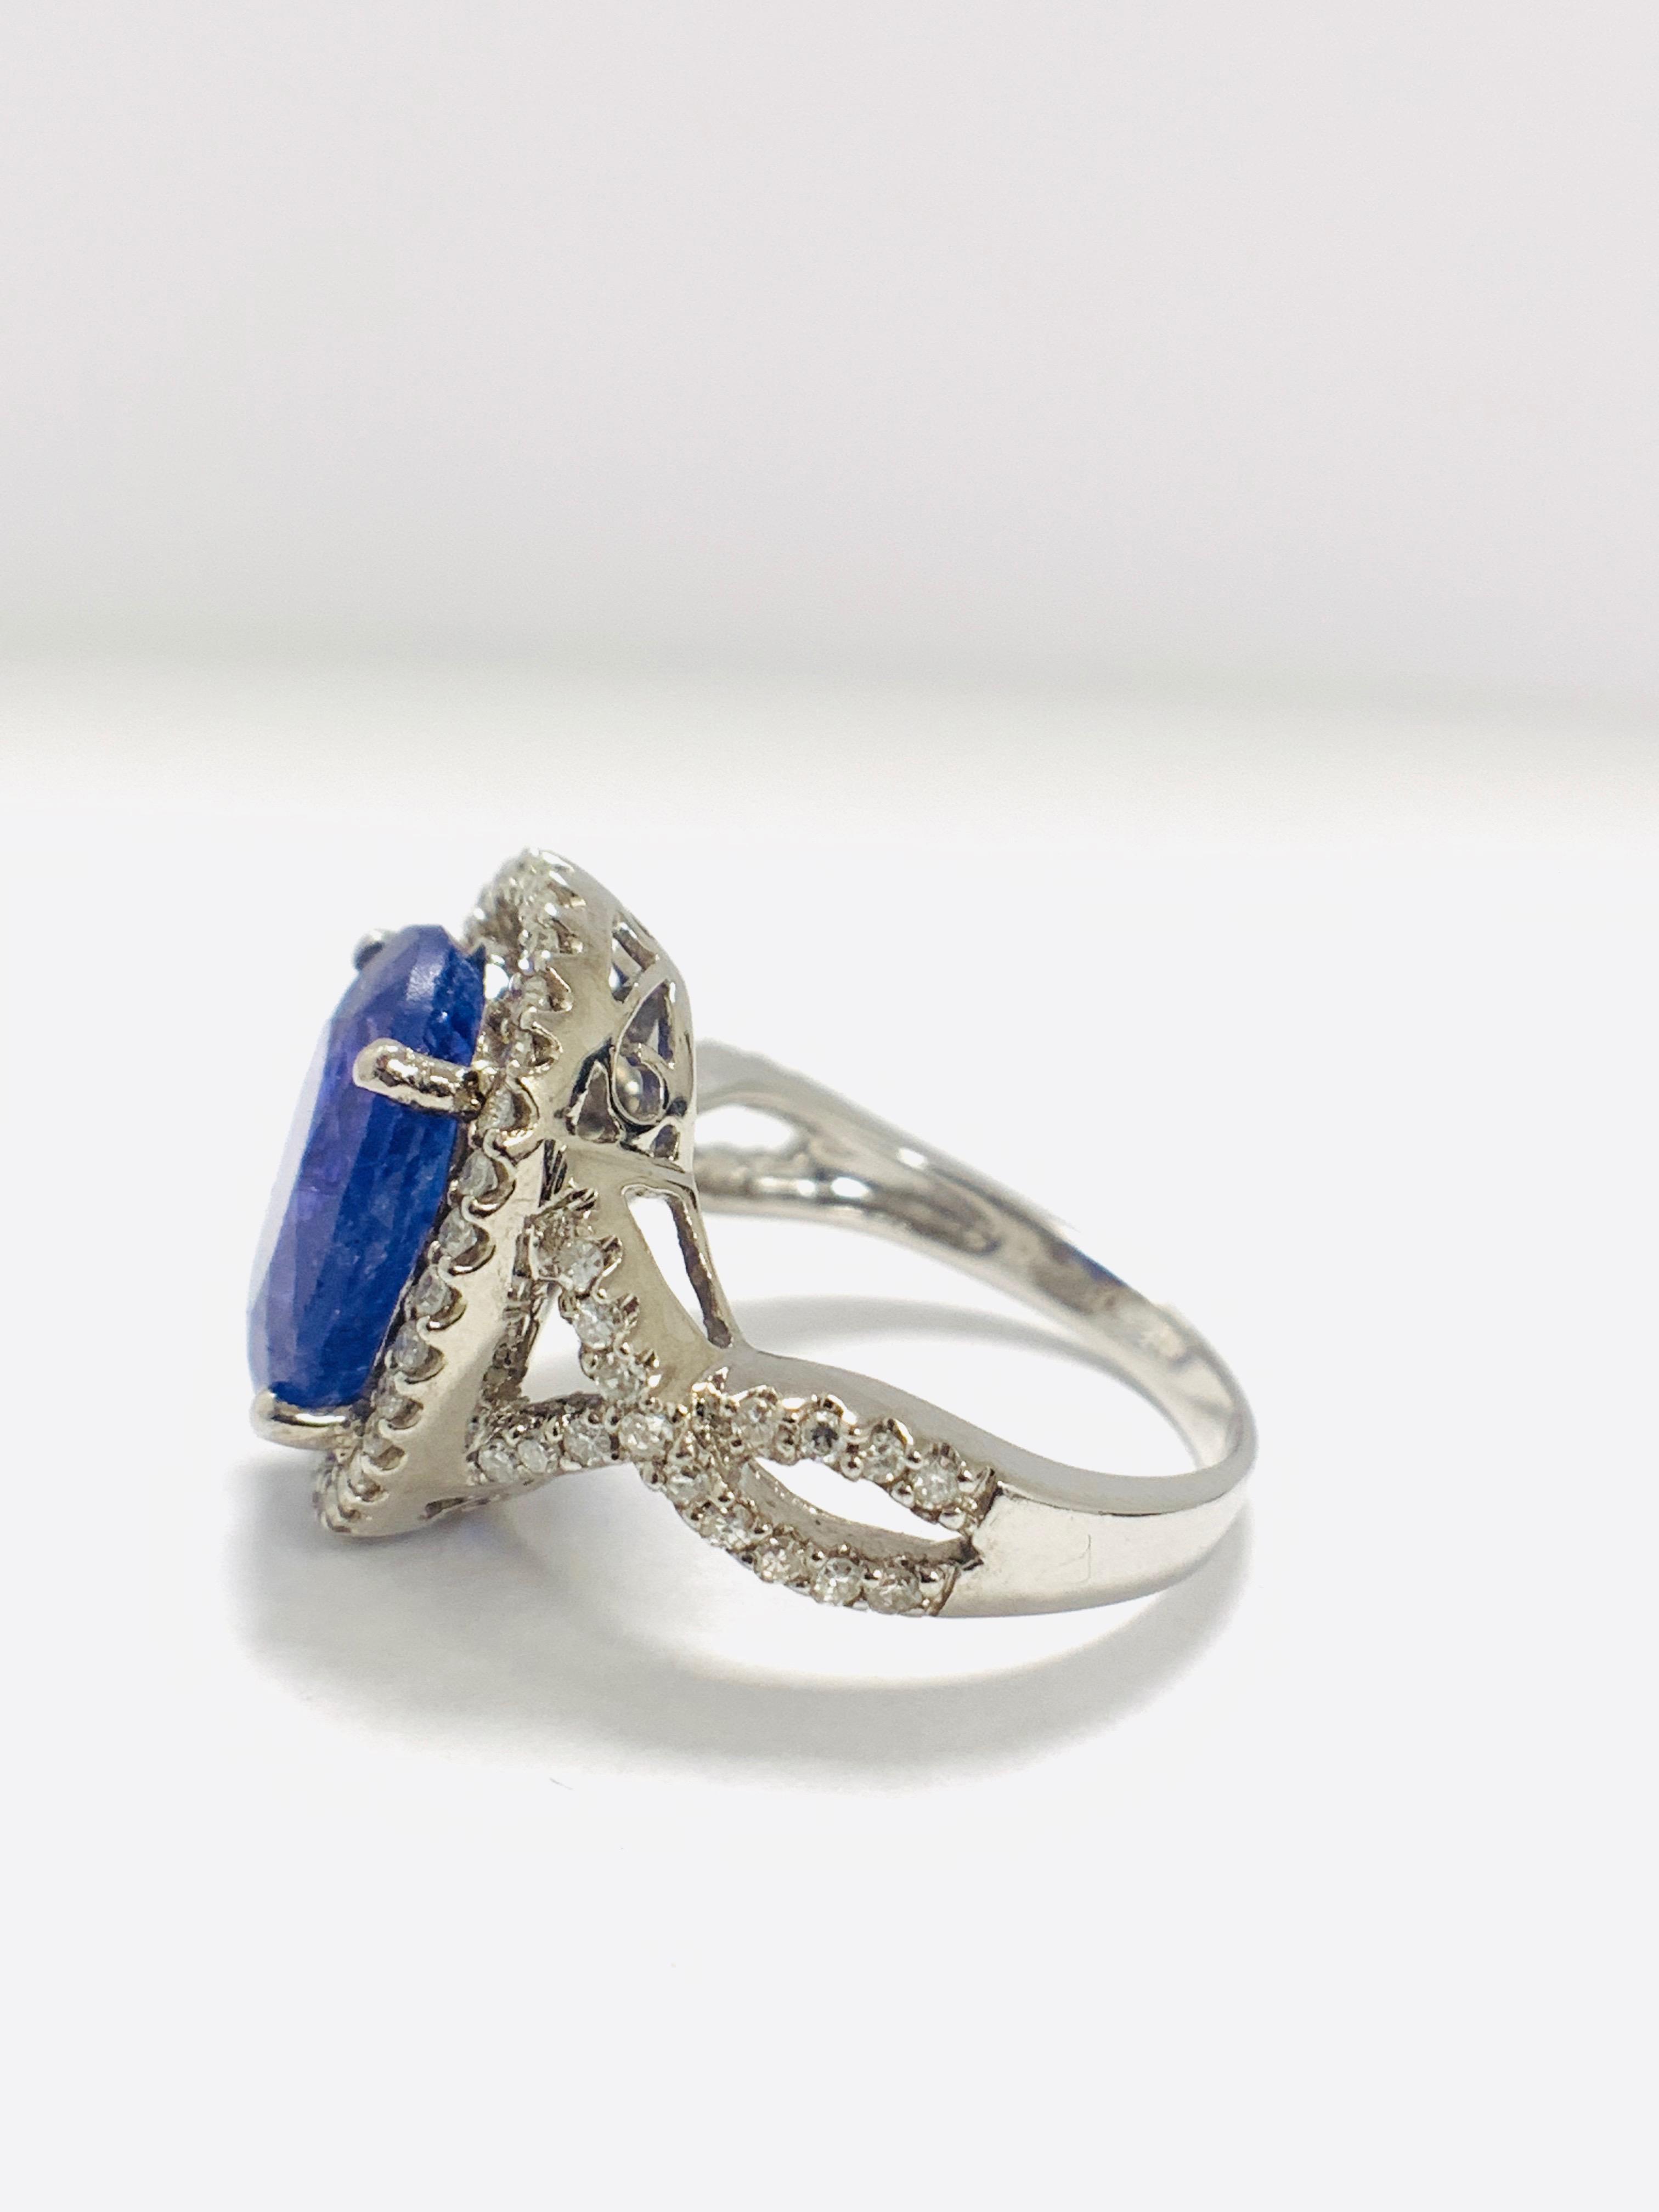 18ct White Gold Tanzanite and Diamond ring - Image 3 of 15